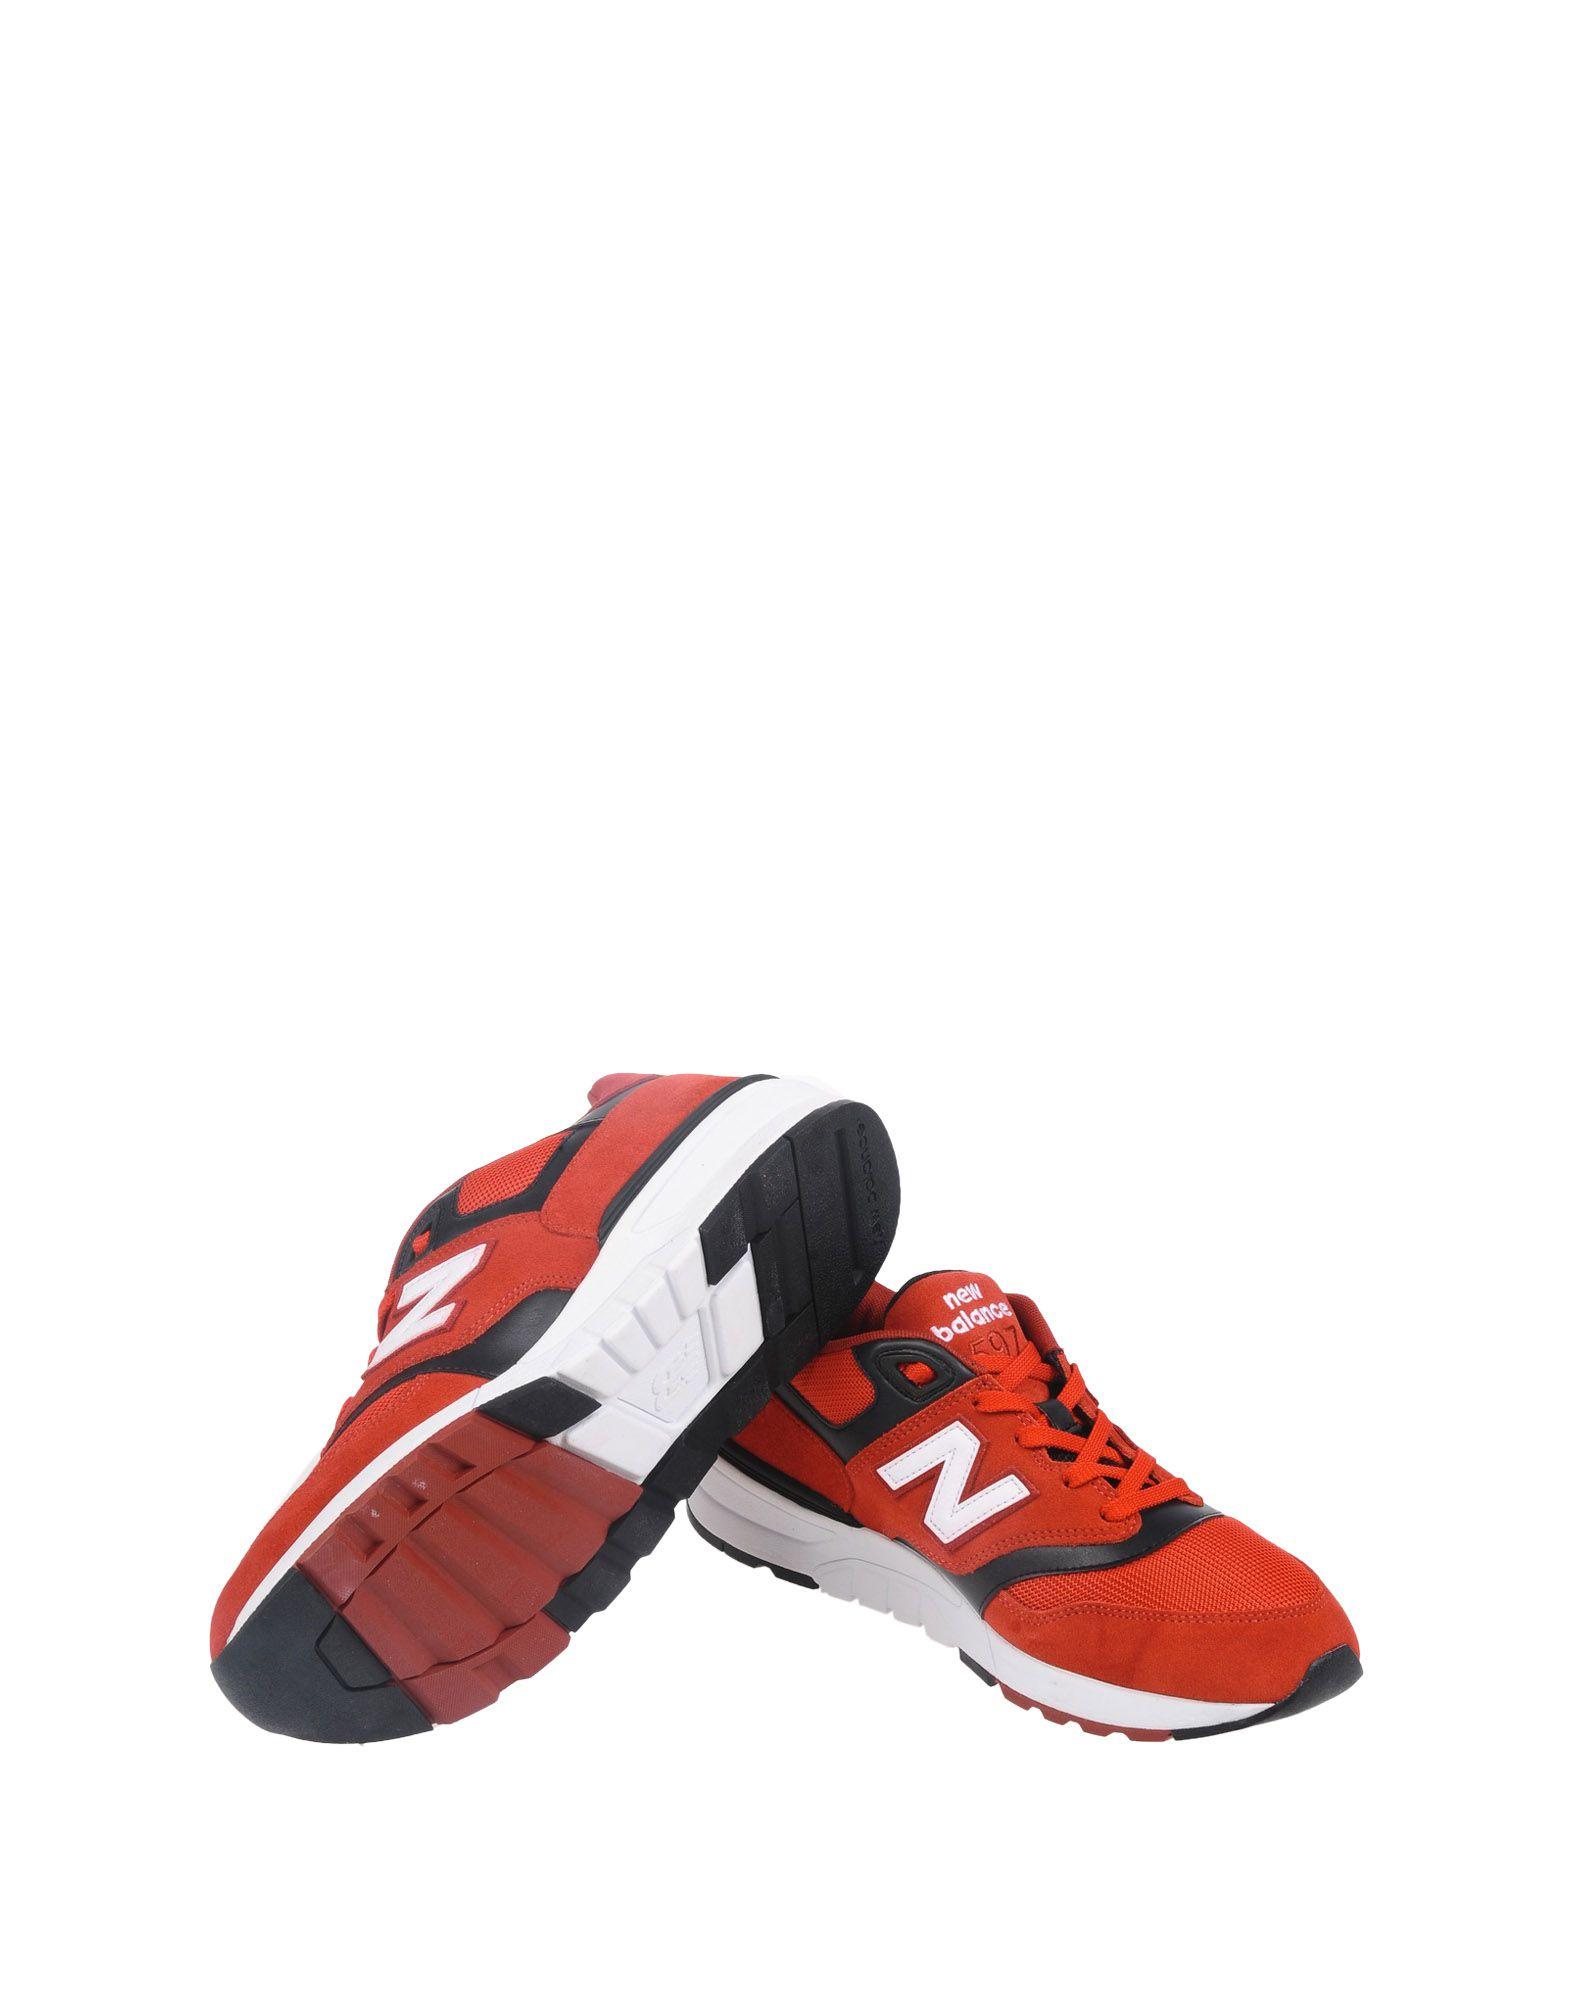 New Balance 597 Classic Running - Sneakers - Men Men Men New Balance Sneakers online on  Canada - 11196430NO 40eaf8